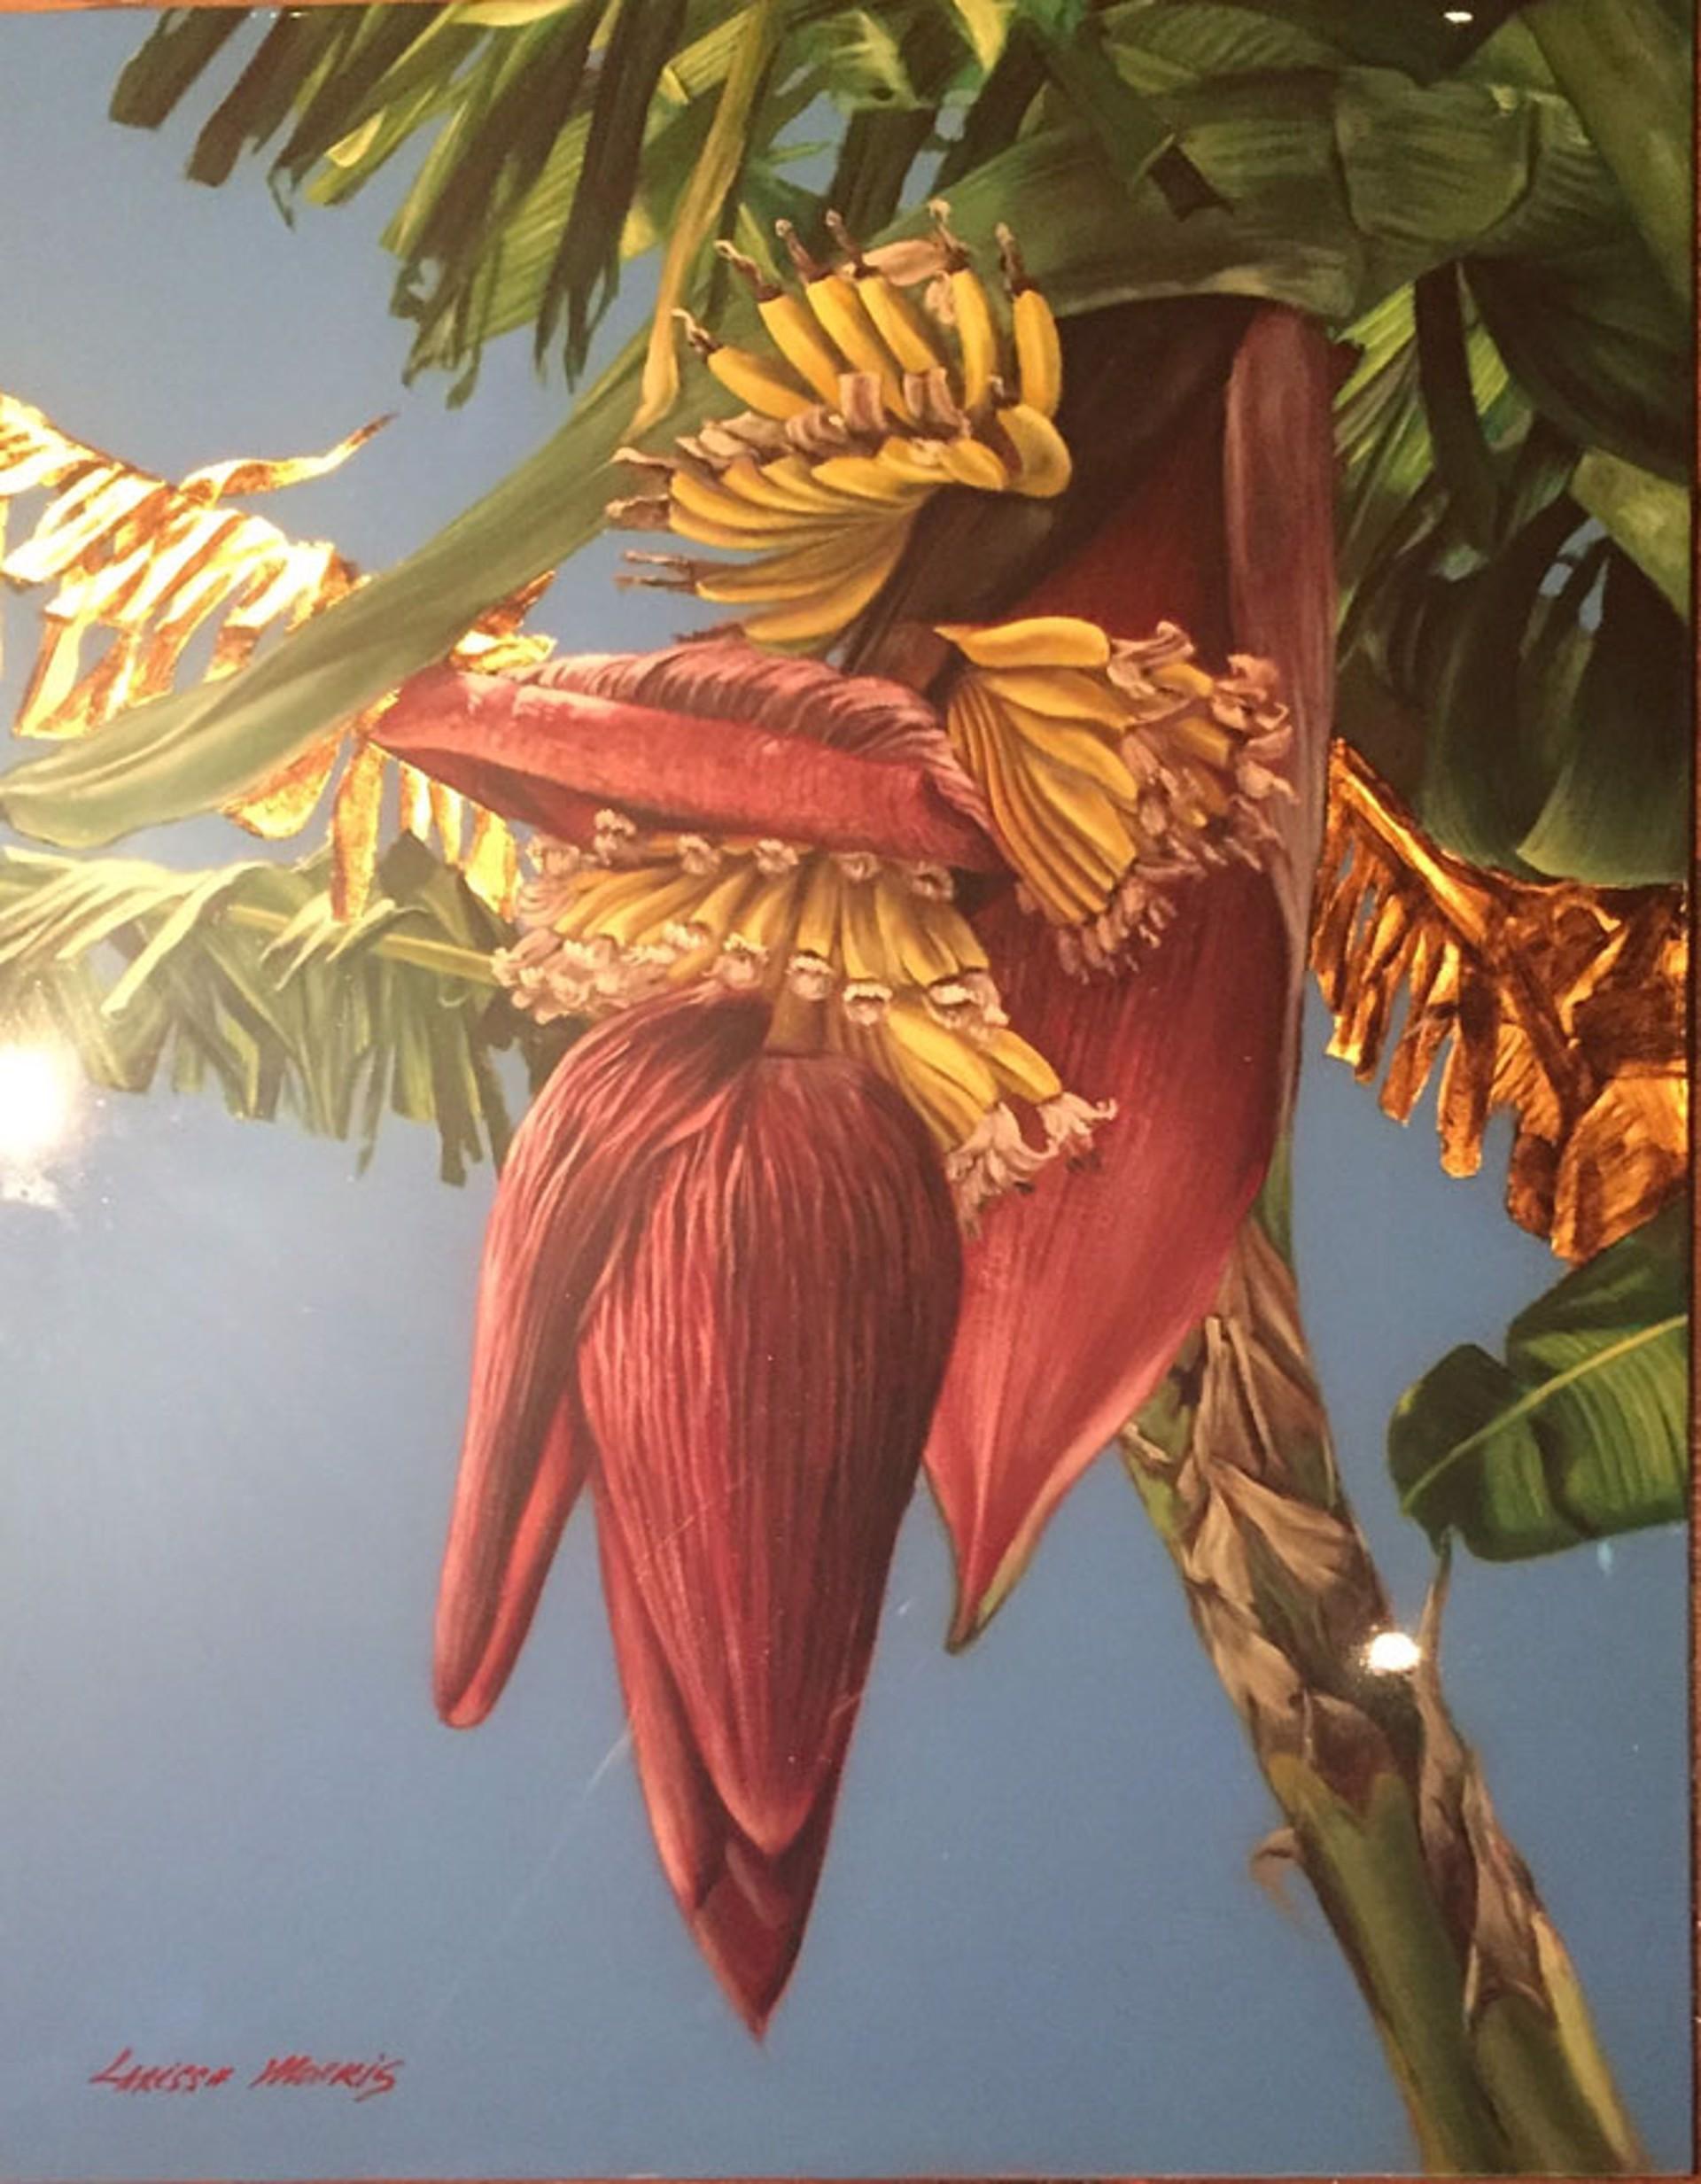 Banana Flower II by Larissa Morais